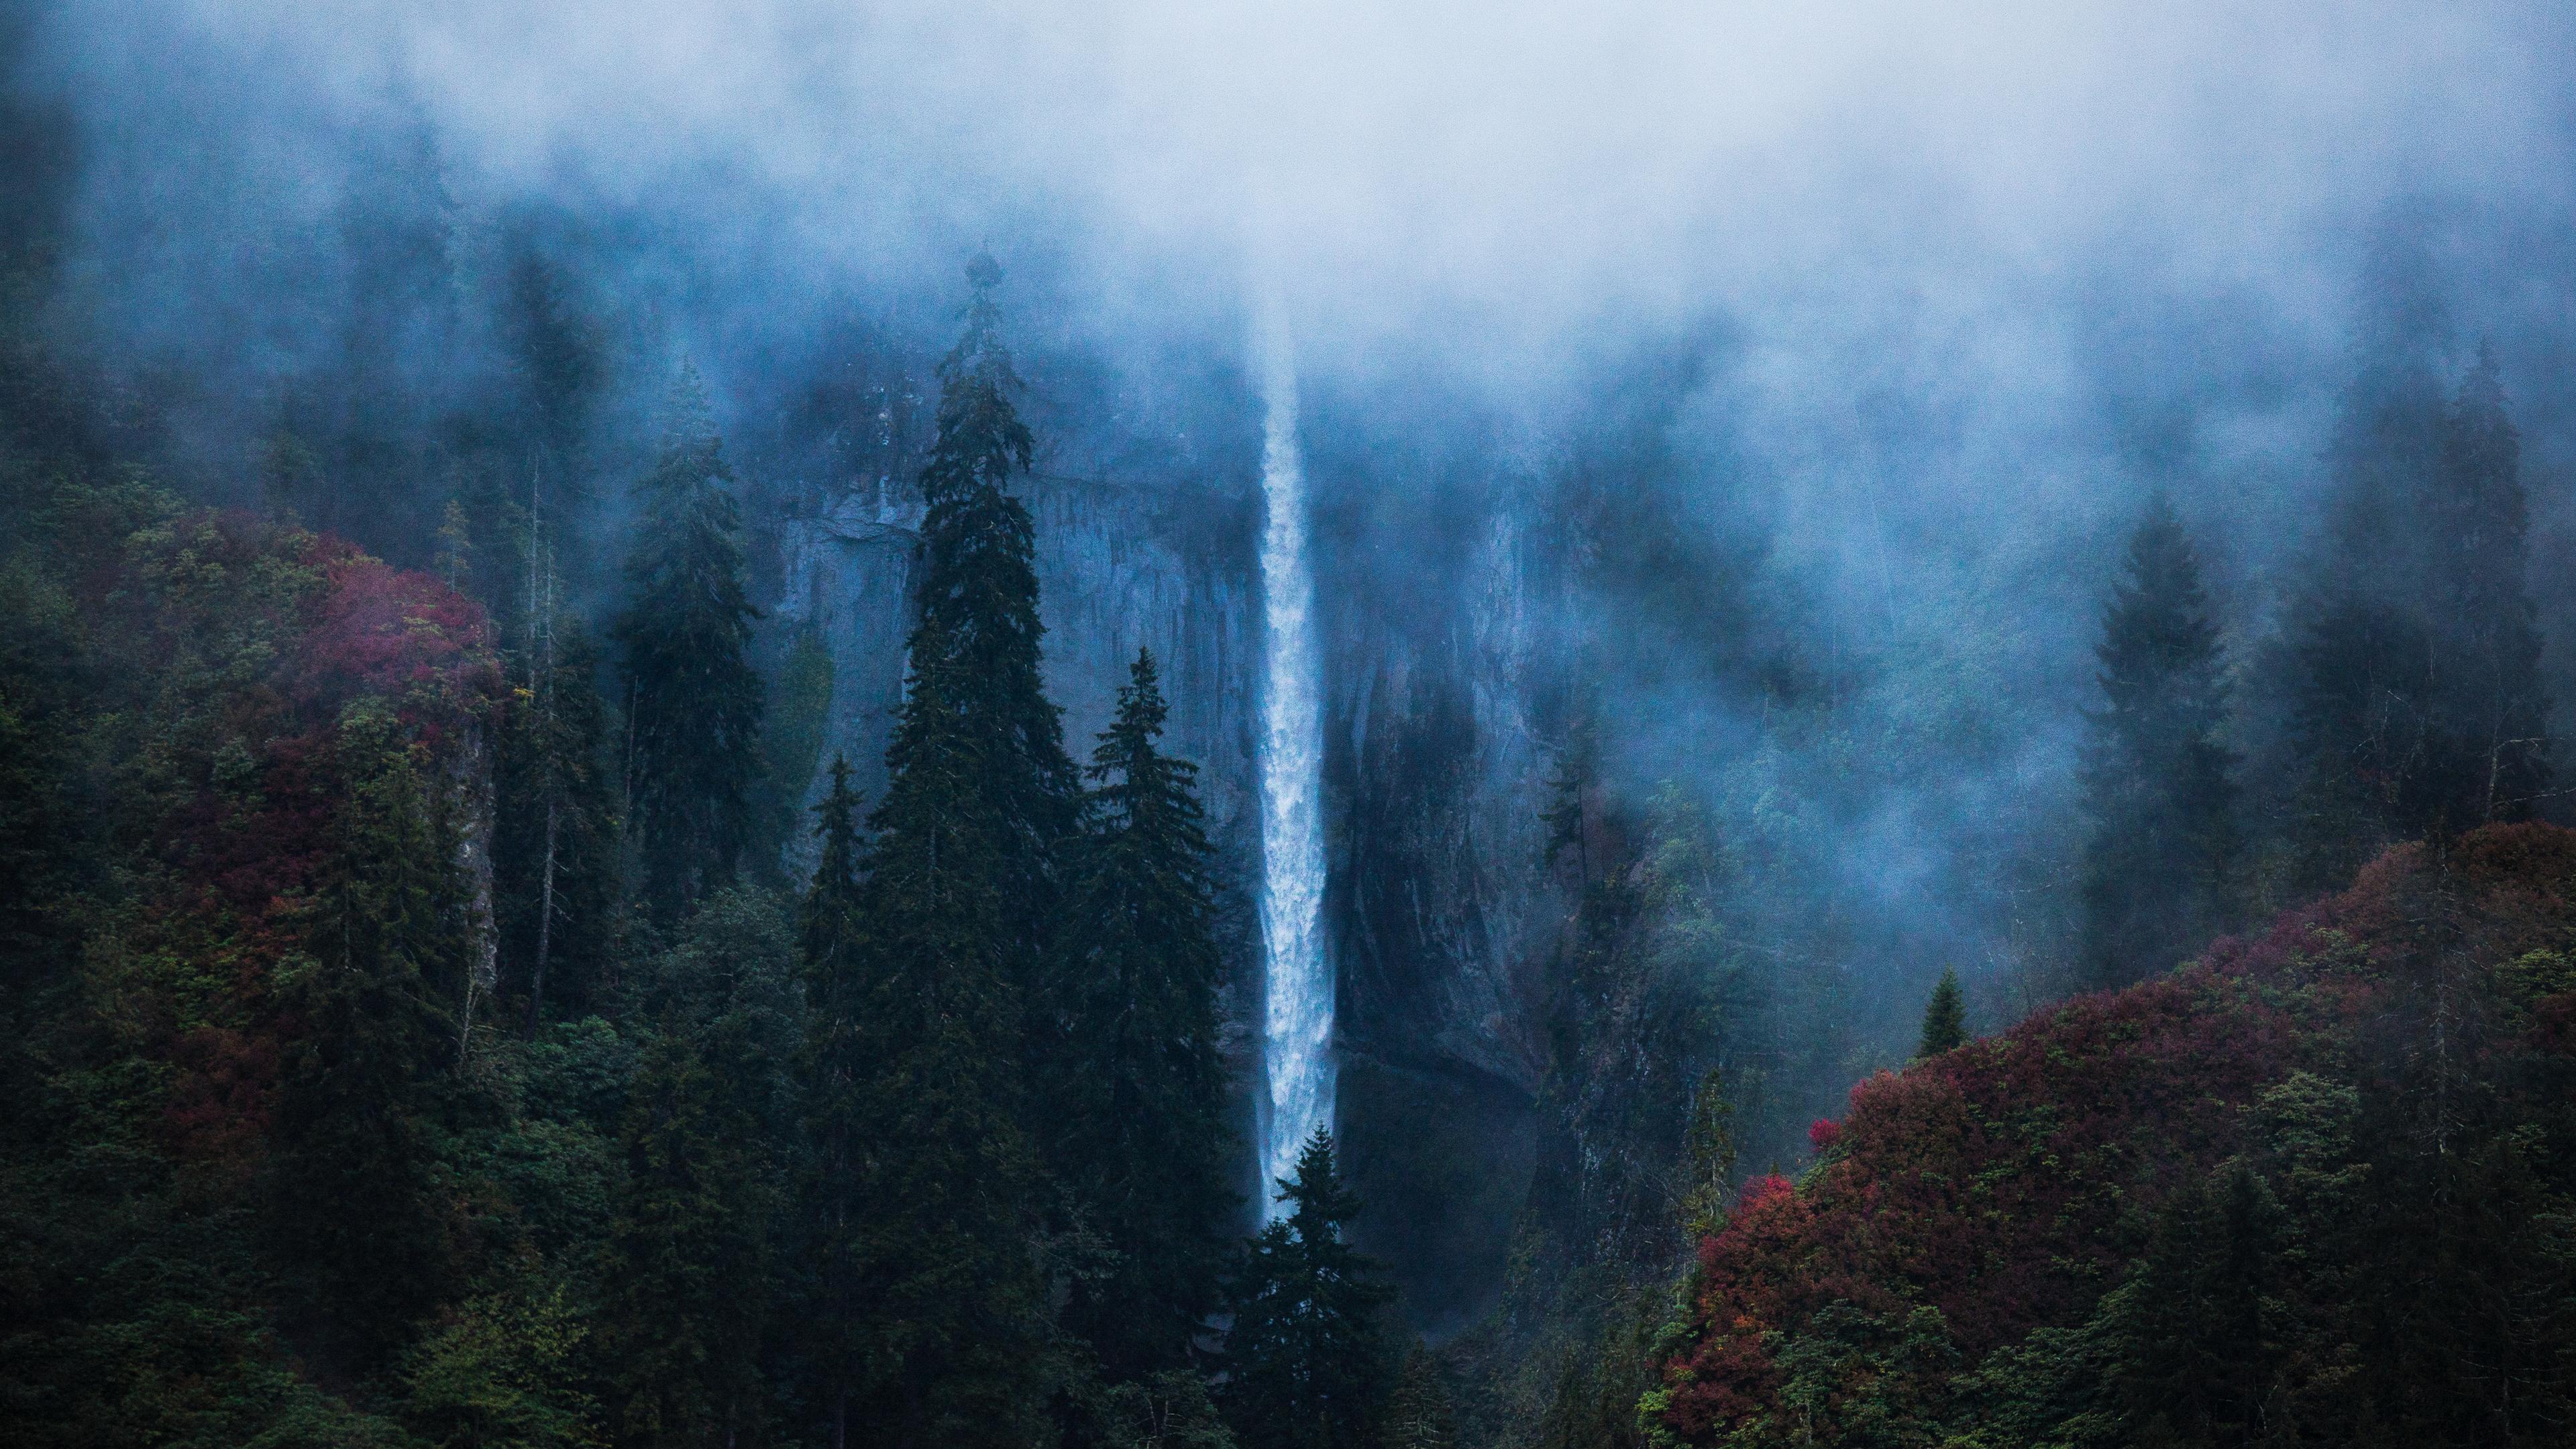 Wallpaper 4k Waterfall Borcka Karagol In Turkey 4k 4k